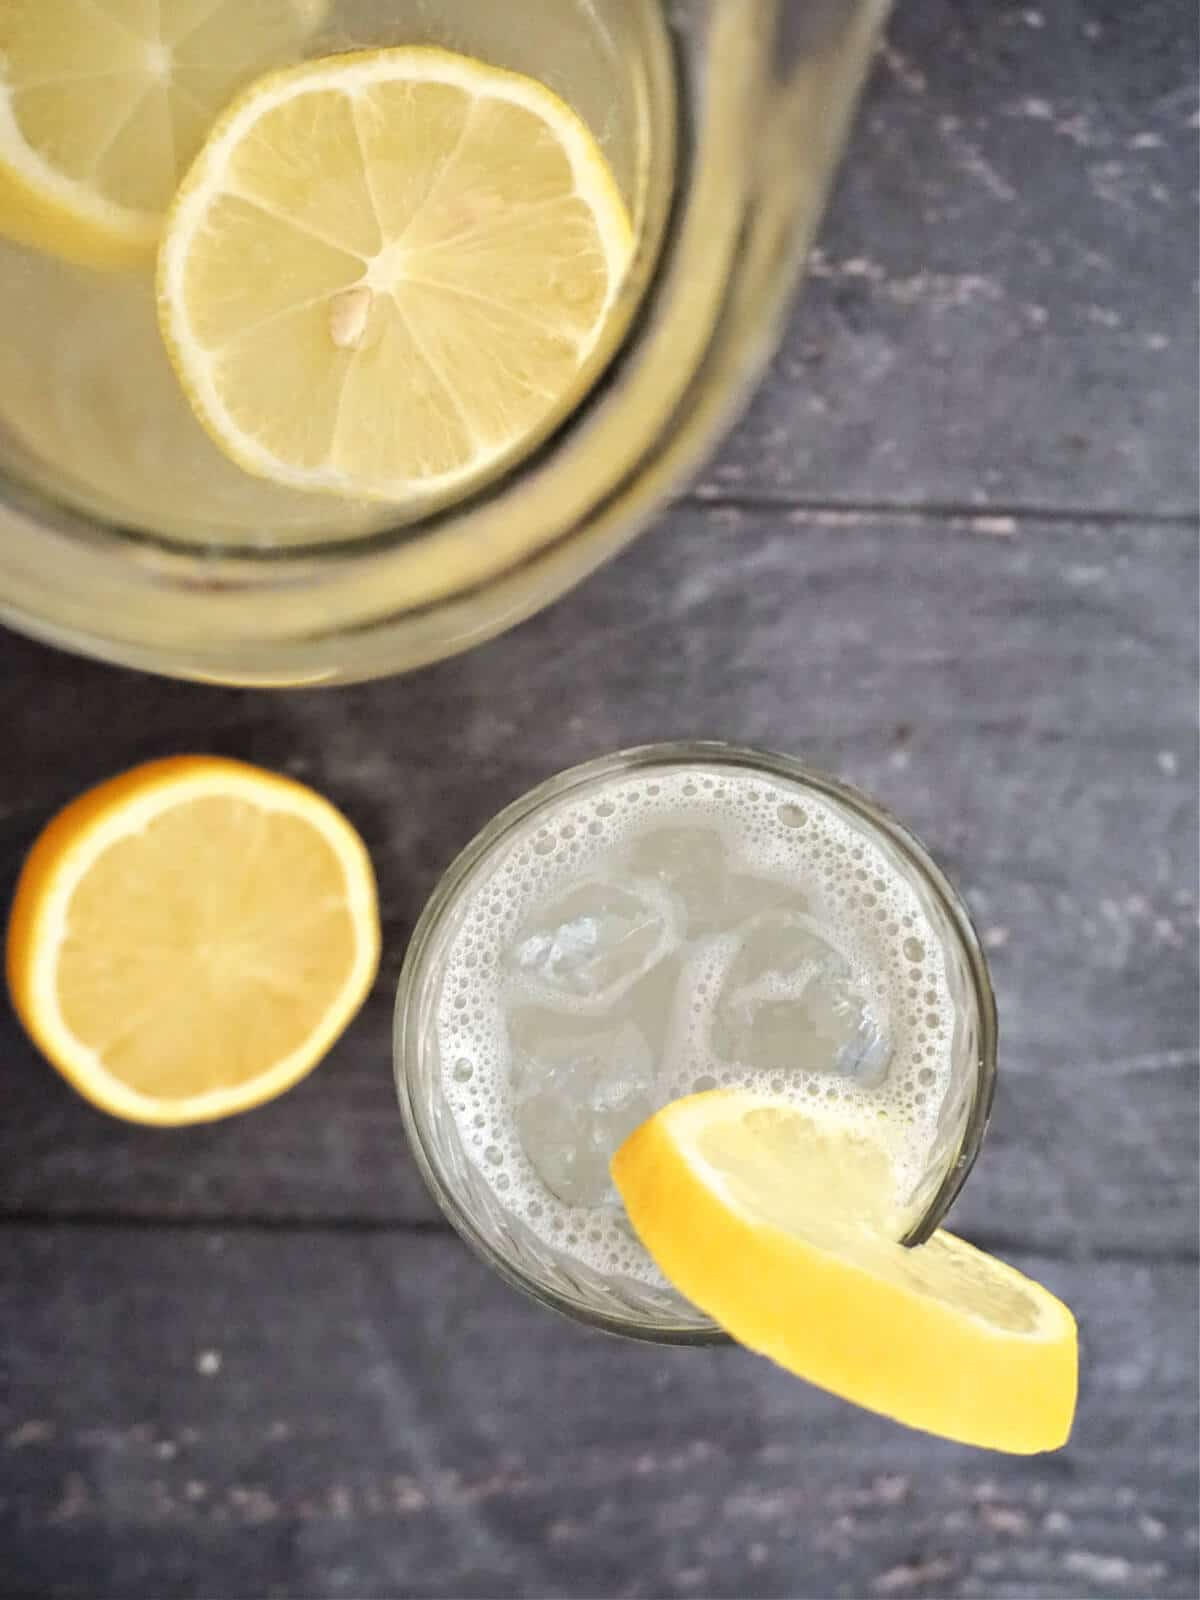 Overhead shot of a glass with lemonade and a slice of lemon on its edge, half a lemon next to the glass and a jug with more lemonade at the top